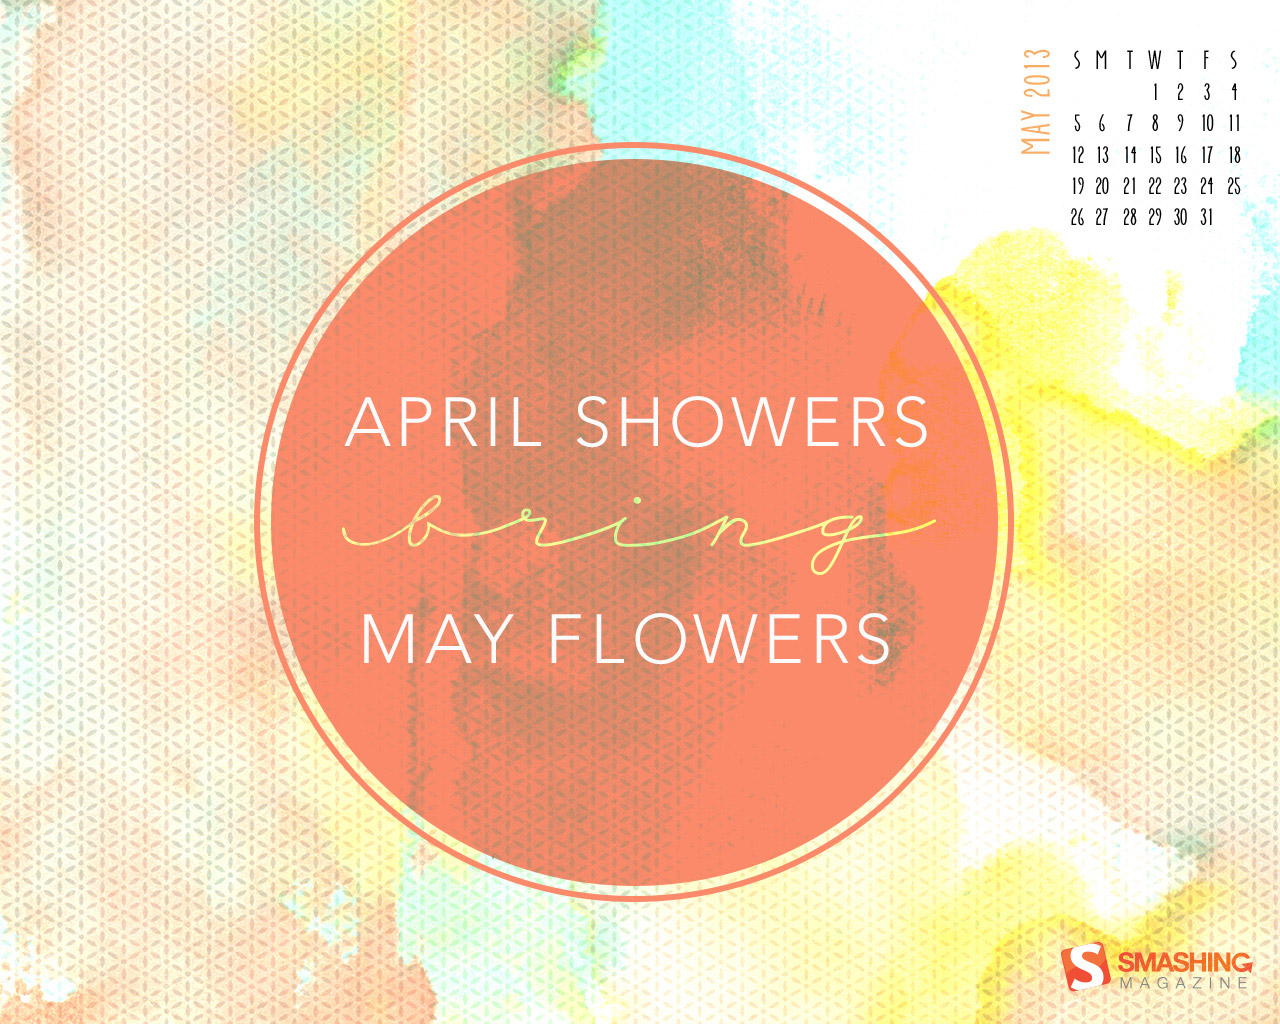 Desktop Wallpaper Calendar April 2011 Smashing Magazine